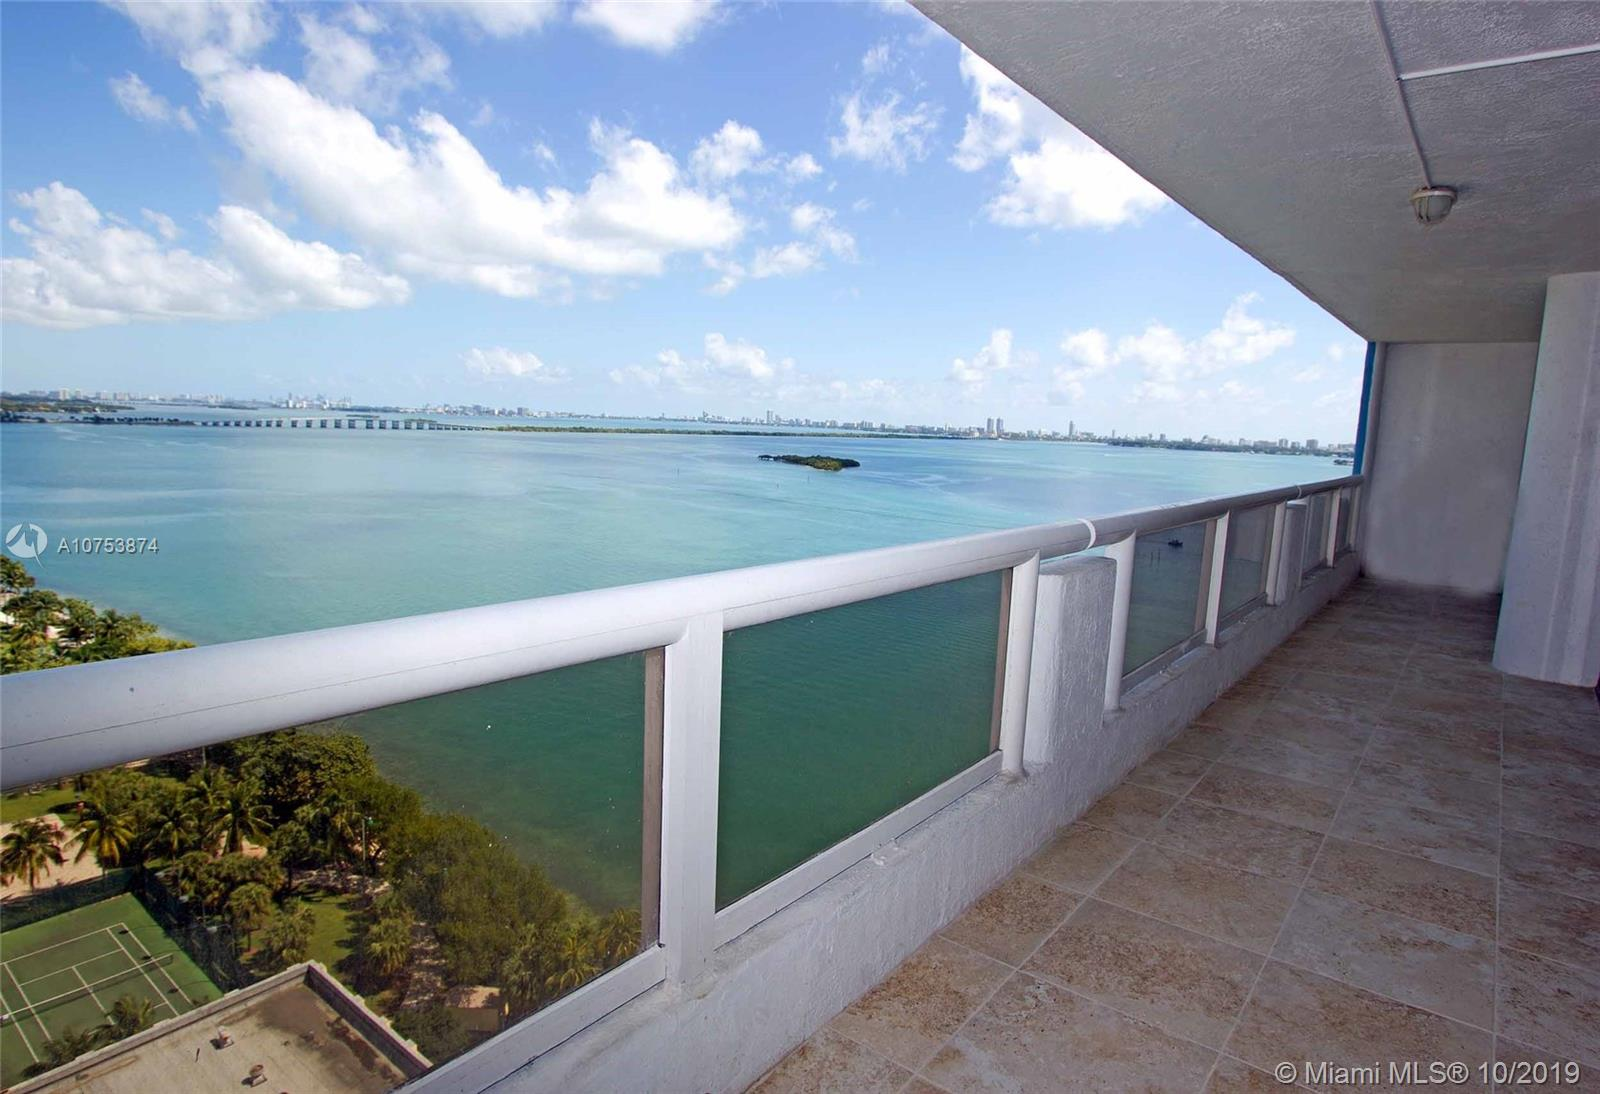 1717 N Bayshore Dr, A-2336 - Miami, Florida